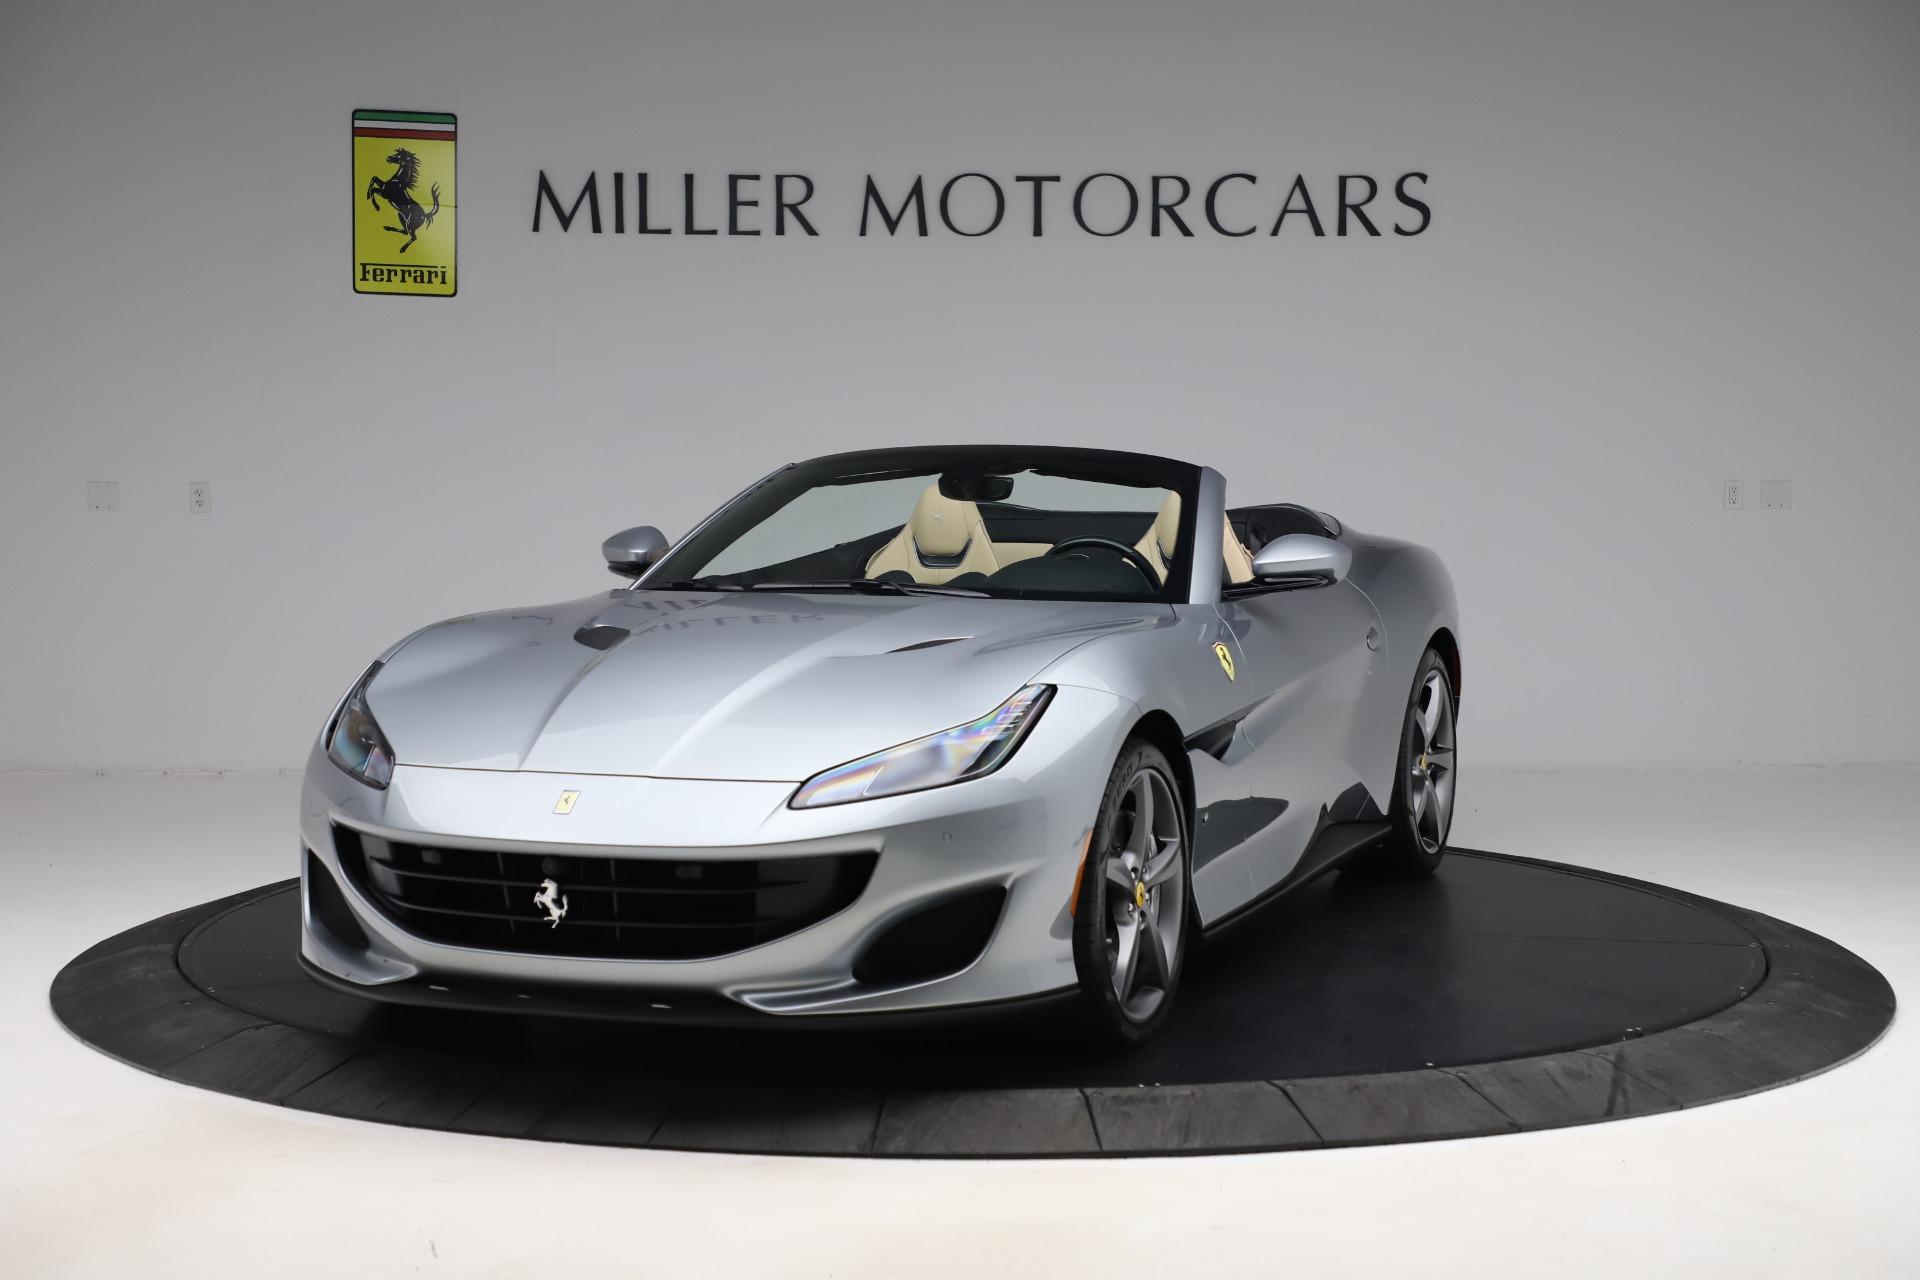 Used 2019 Ferrari Portofino for sale $231,900 at Alfa Romeo of Westport in Westport CT 06880 1